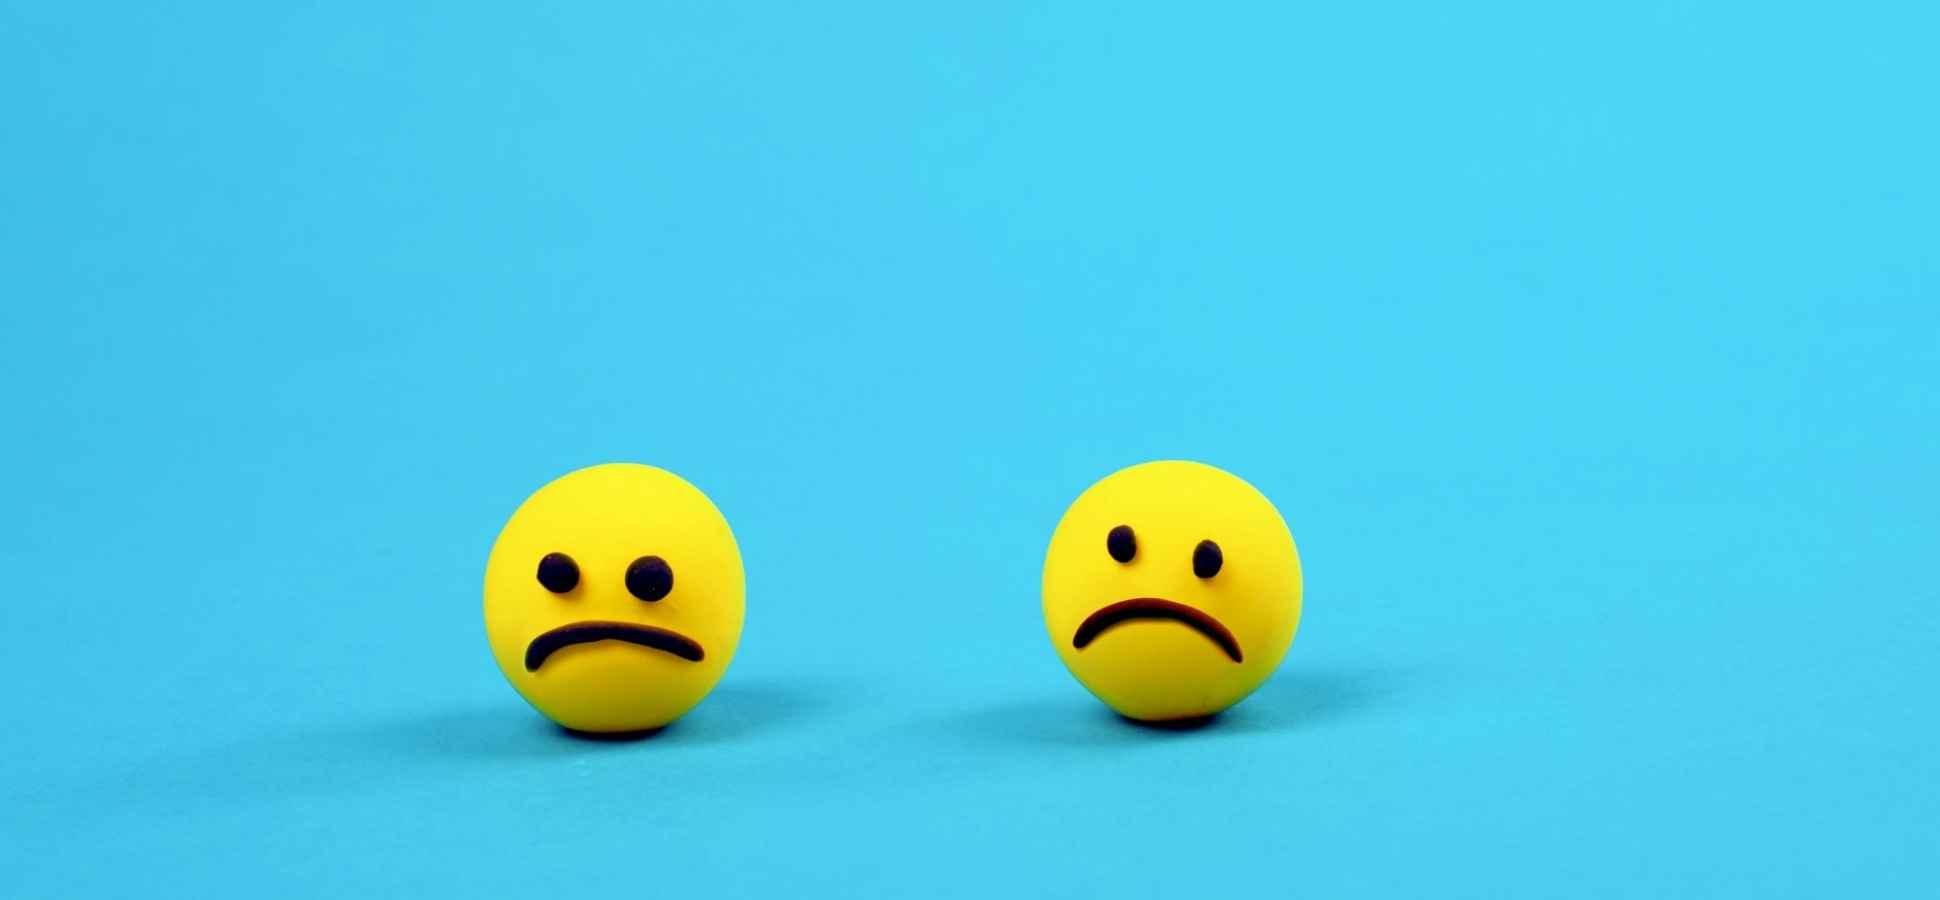 11 Emojis That Make You Look Really Unprofessional At Work Inccom